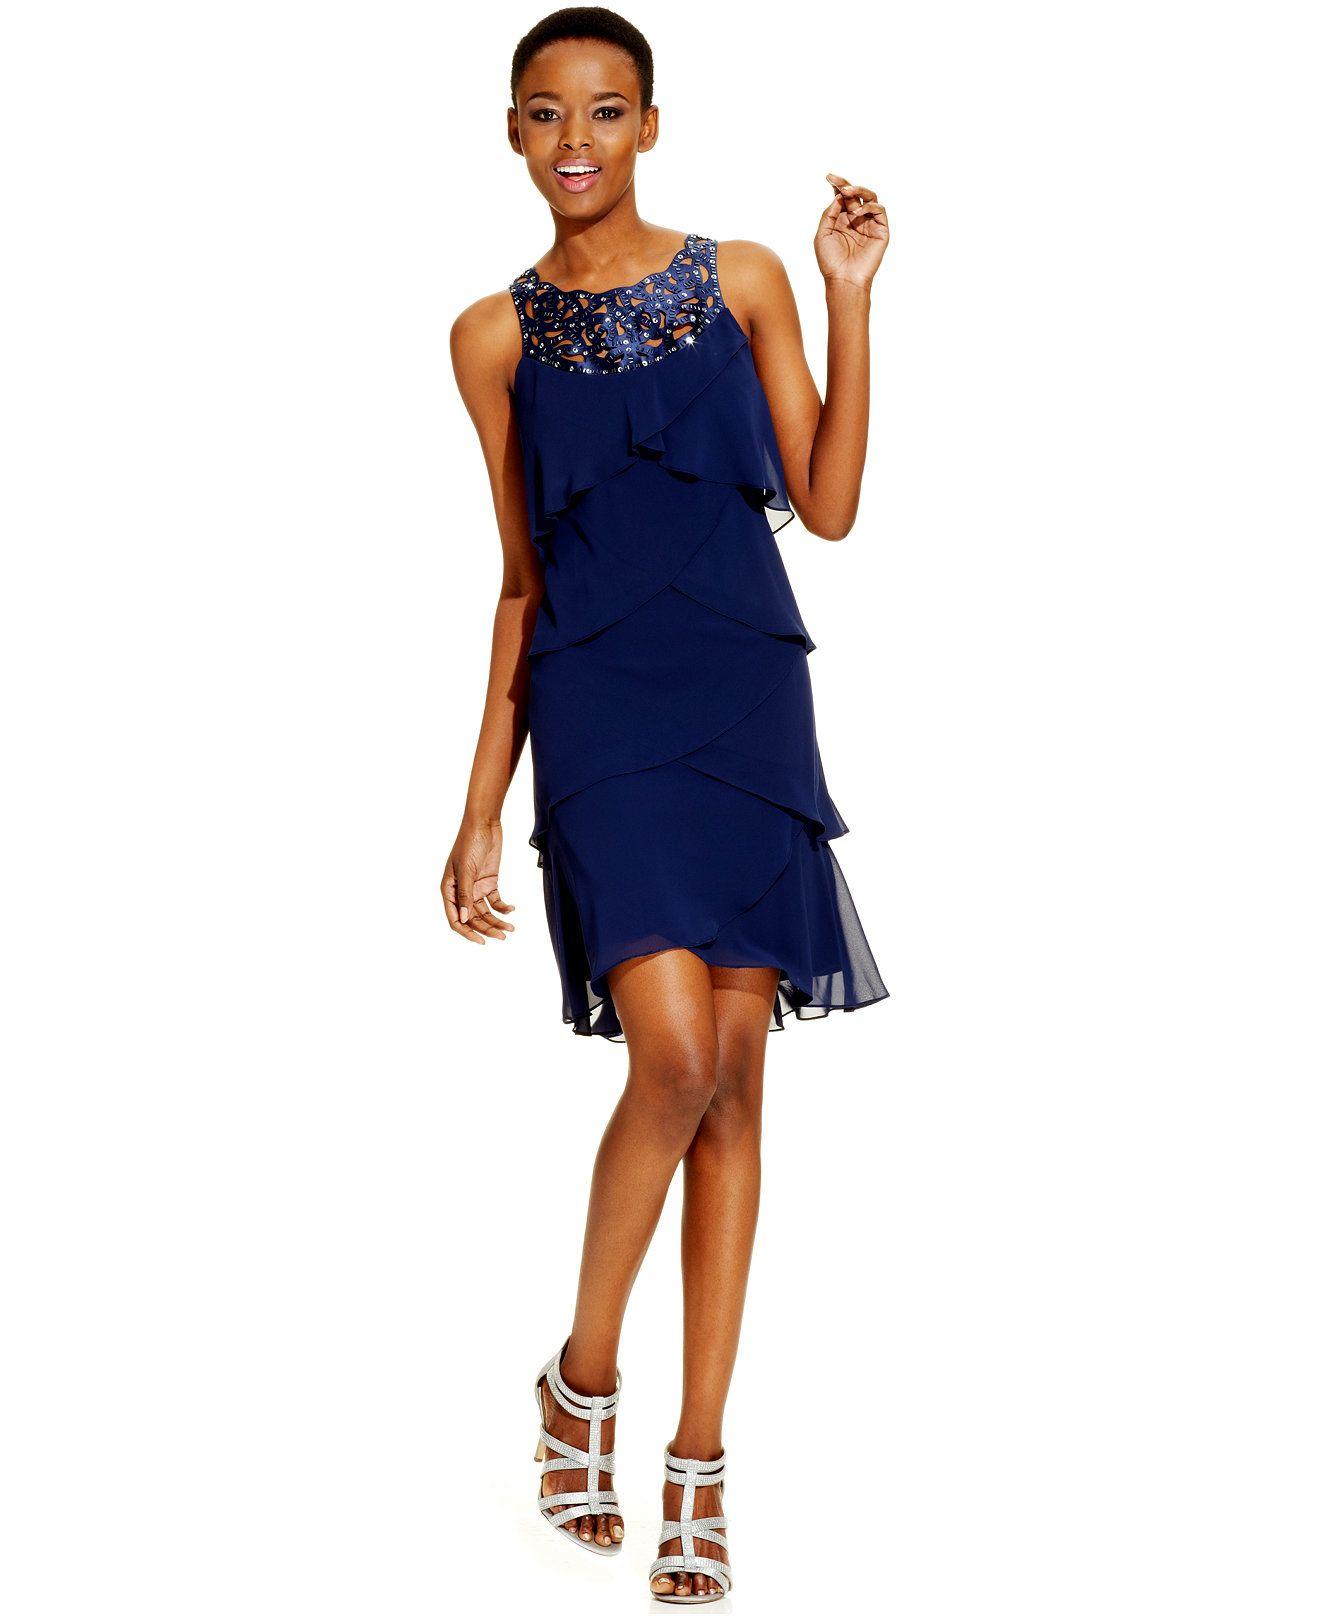 Sl sl fashion dresses - Sl Fashions Embellished Tiered Shift Dress